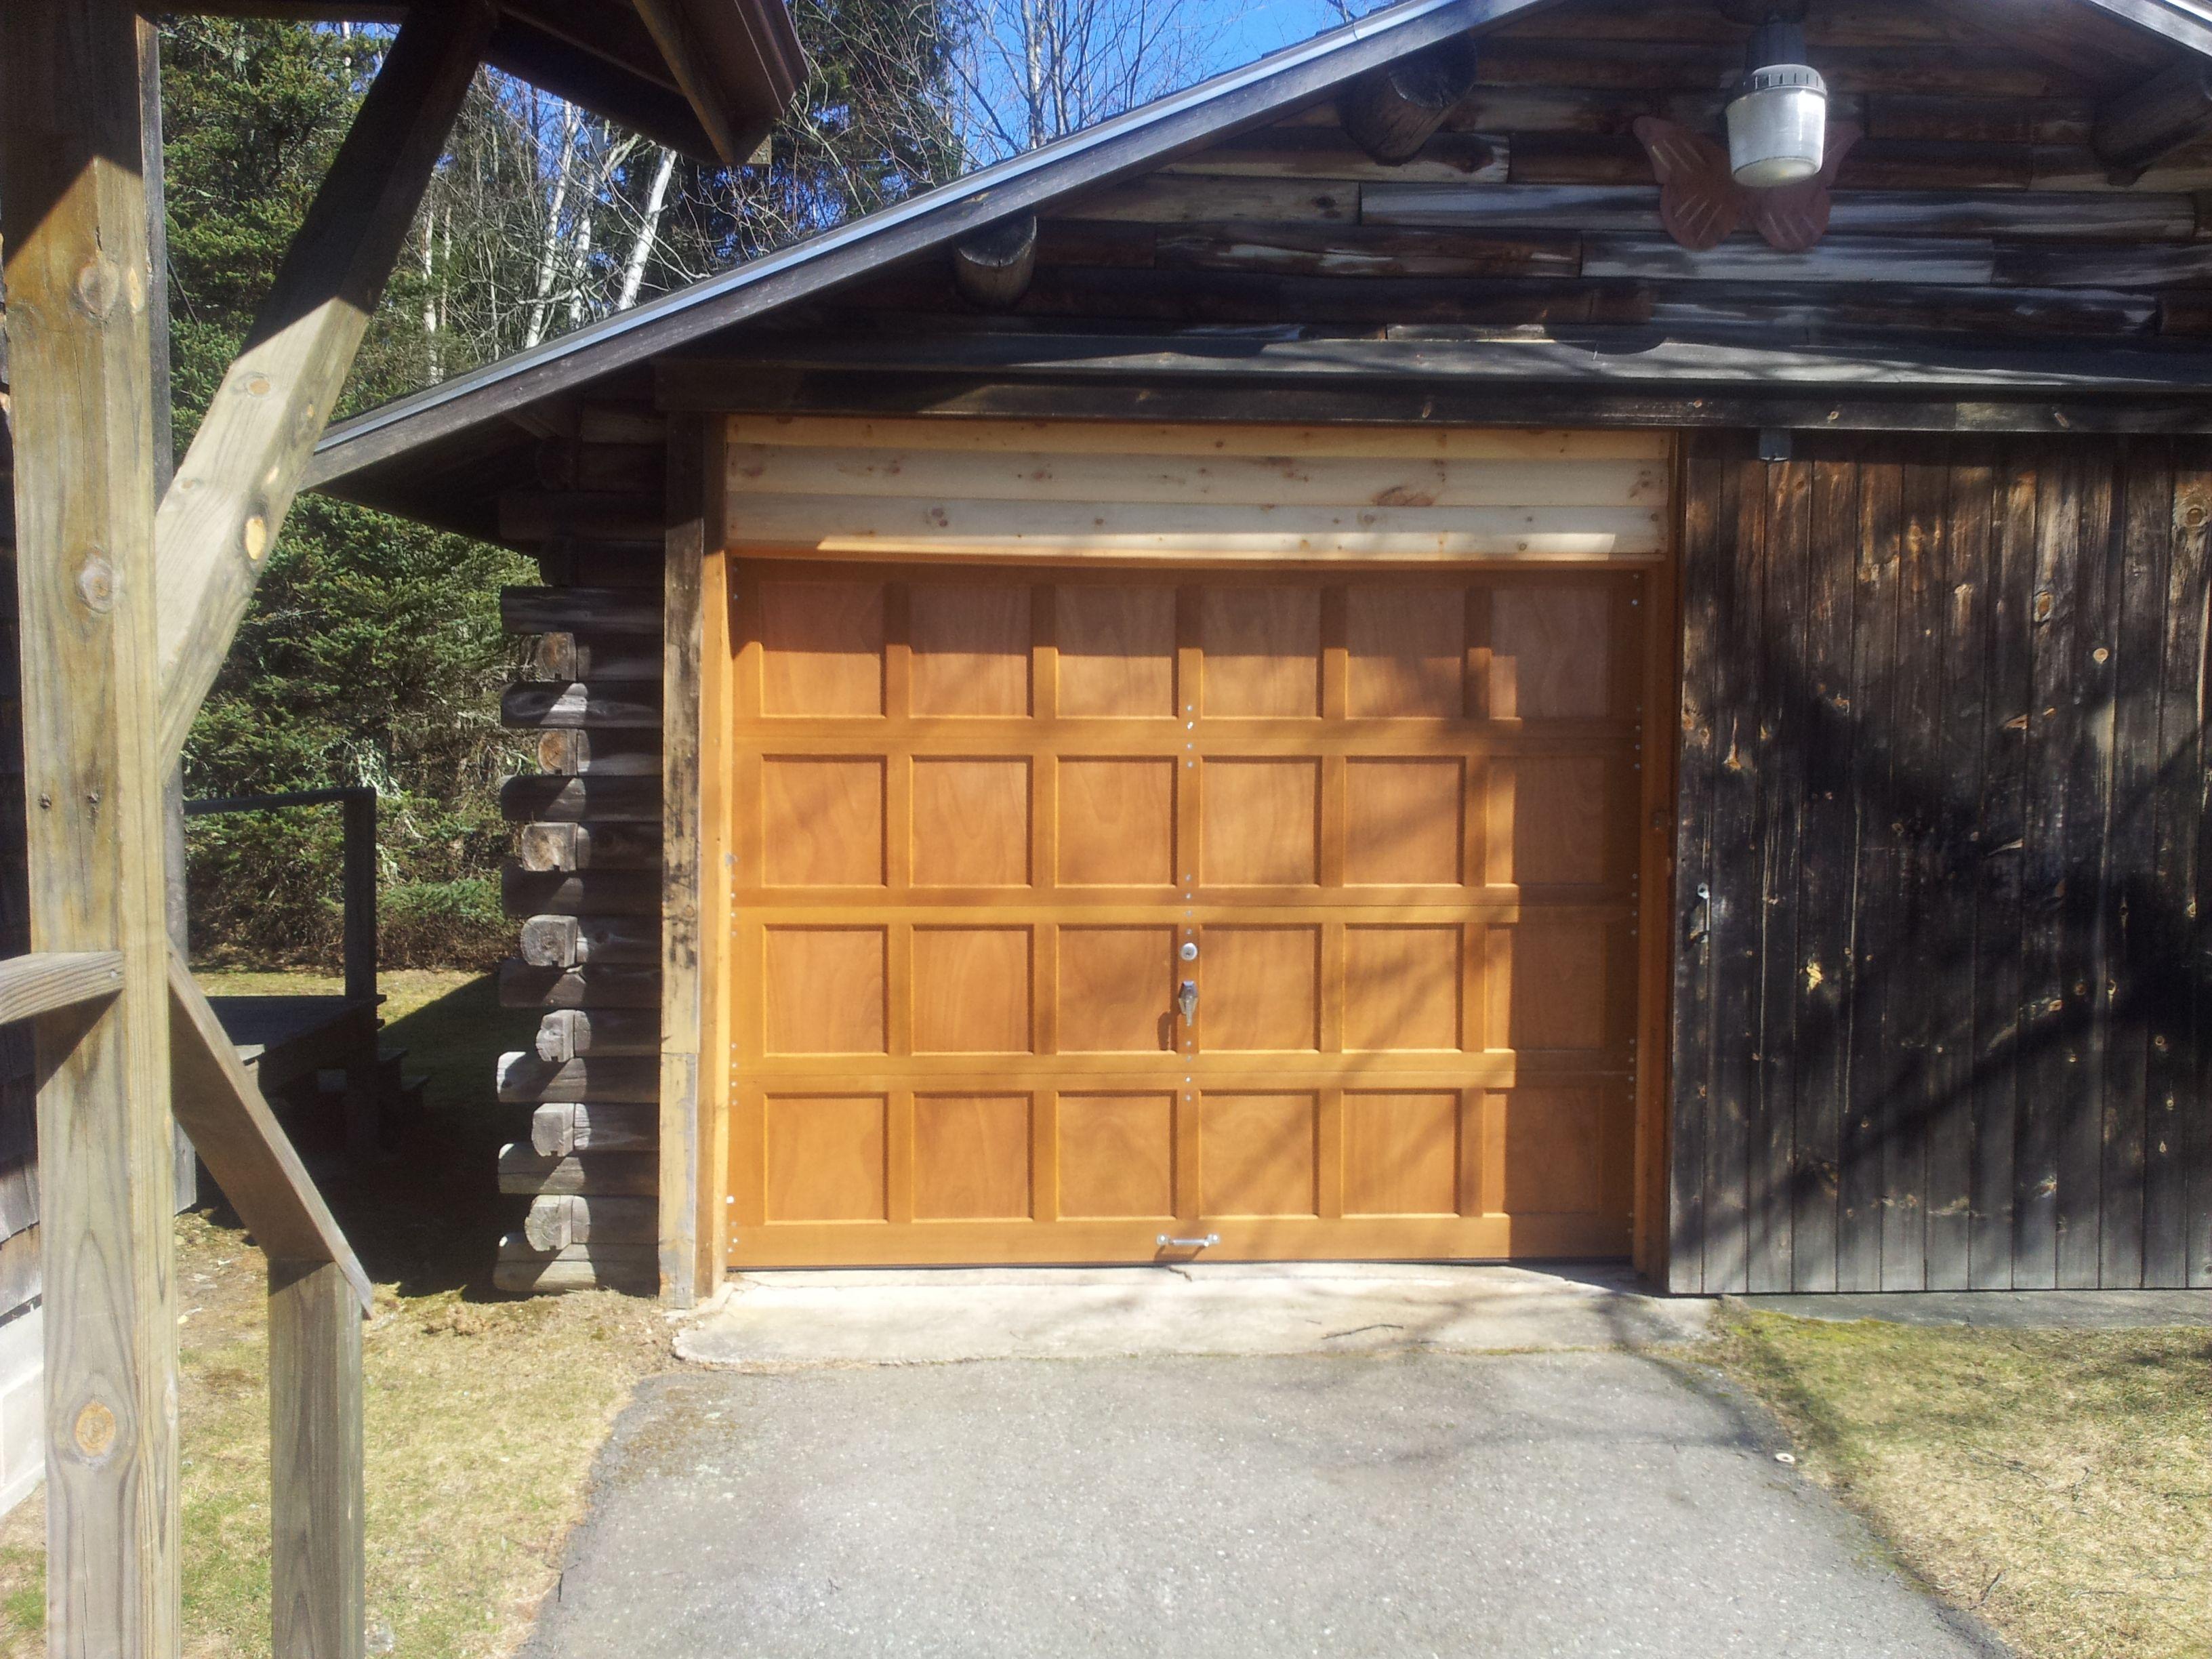 Mdl43 Stained With Golden Oak Garage Door Styles Residential Garage Doors Wood Garage Doors